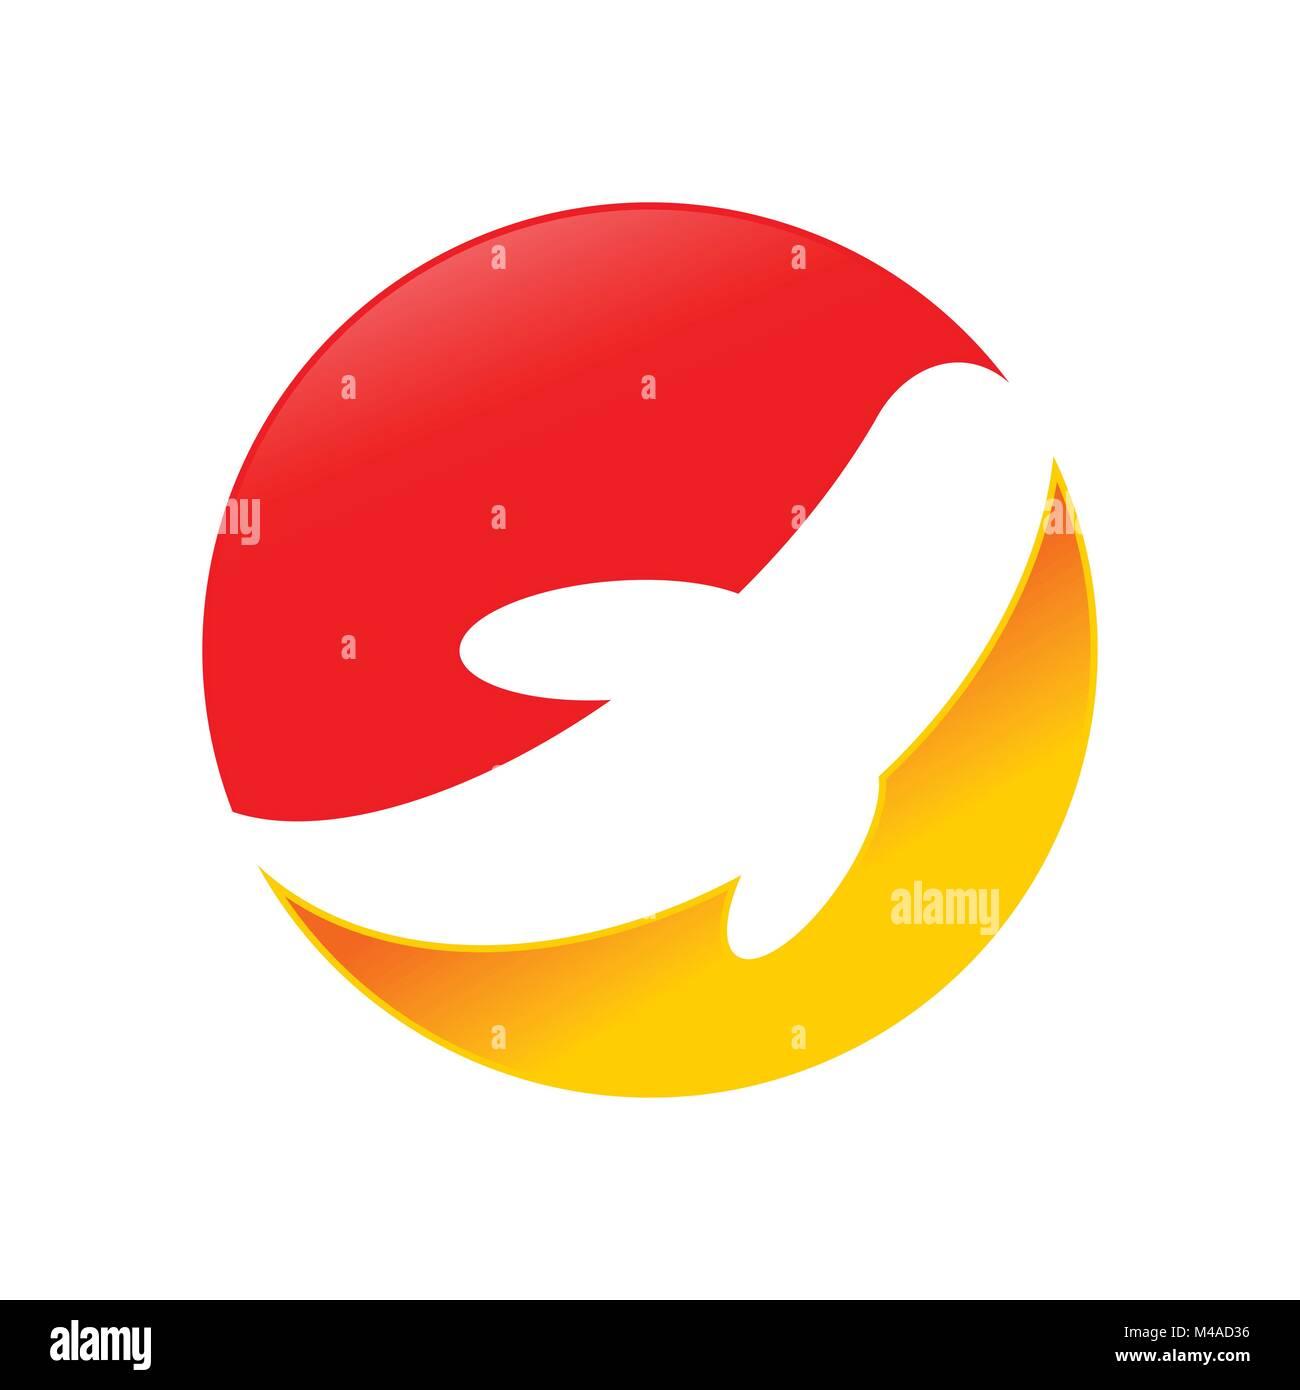 Abstract Koi Fish Vector Symbol Graphic Logo Design Stock Vector Art ...